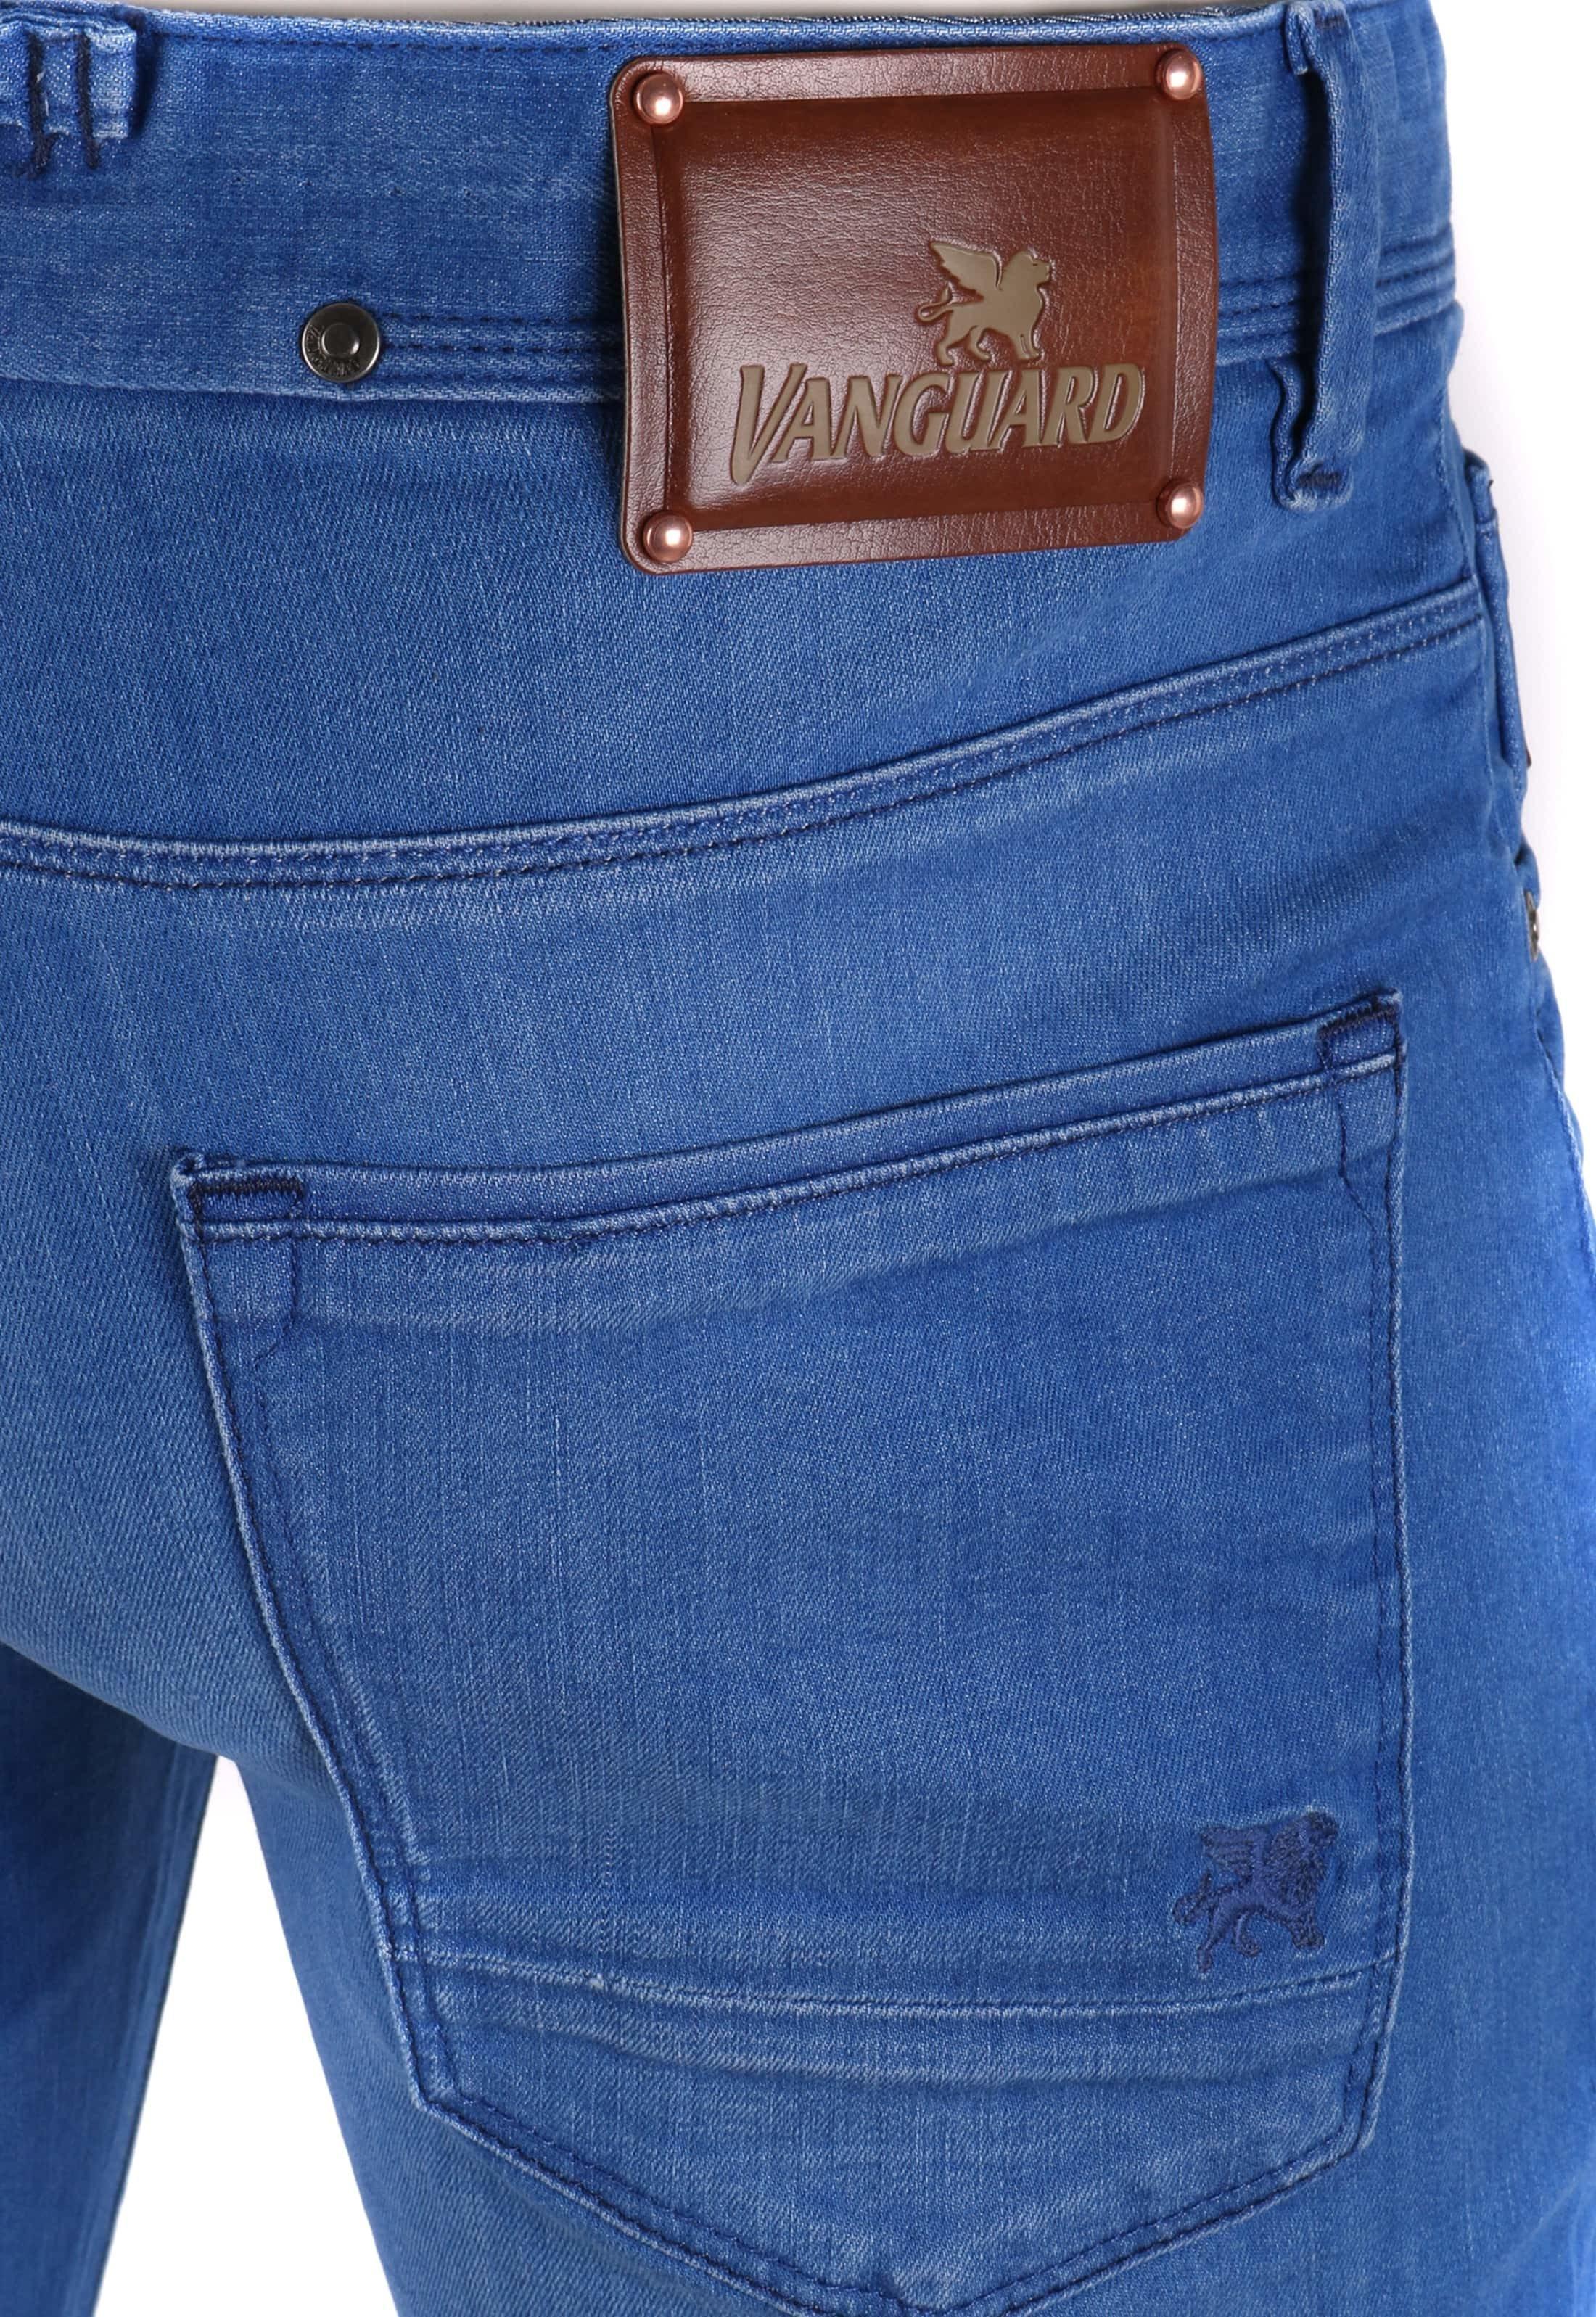 Vanguard V7 Rider Jeans Blue foto 2